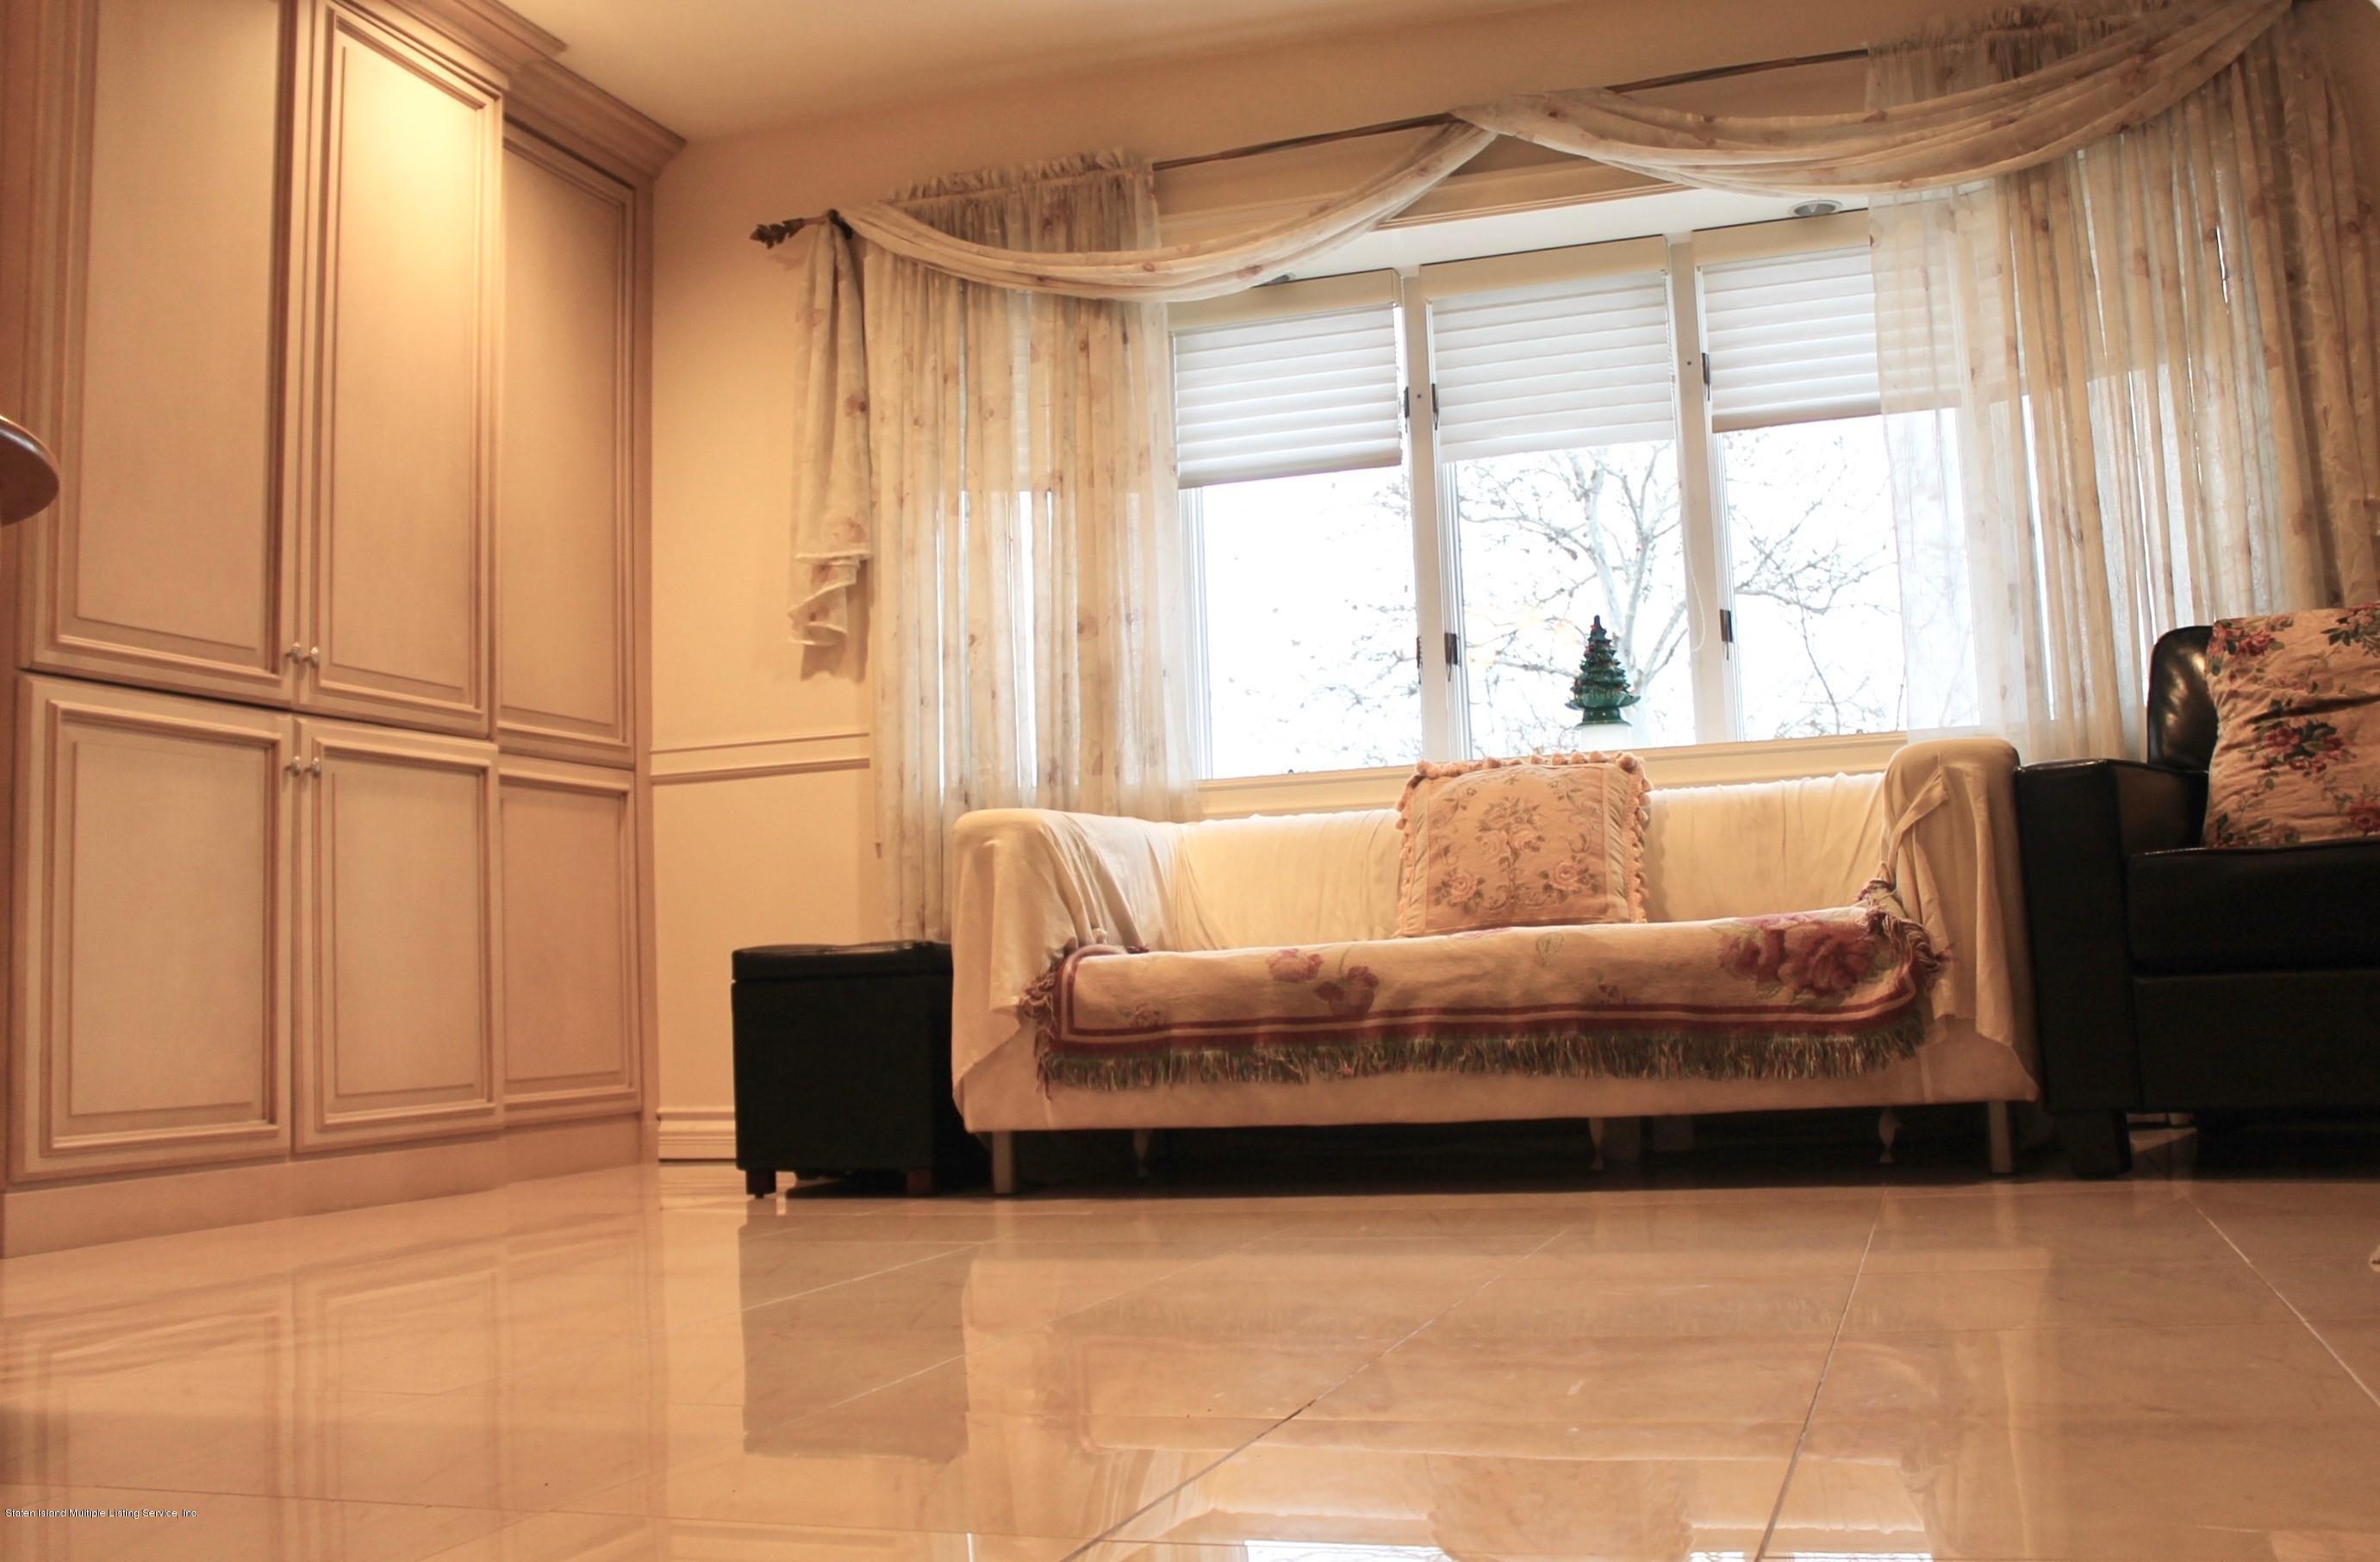 Single Family - Detached 55 Leslie Avenue  Staten Island, NY 10305, MLS-1125926-4